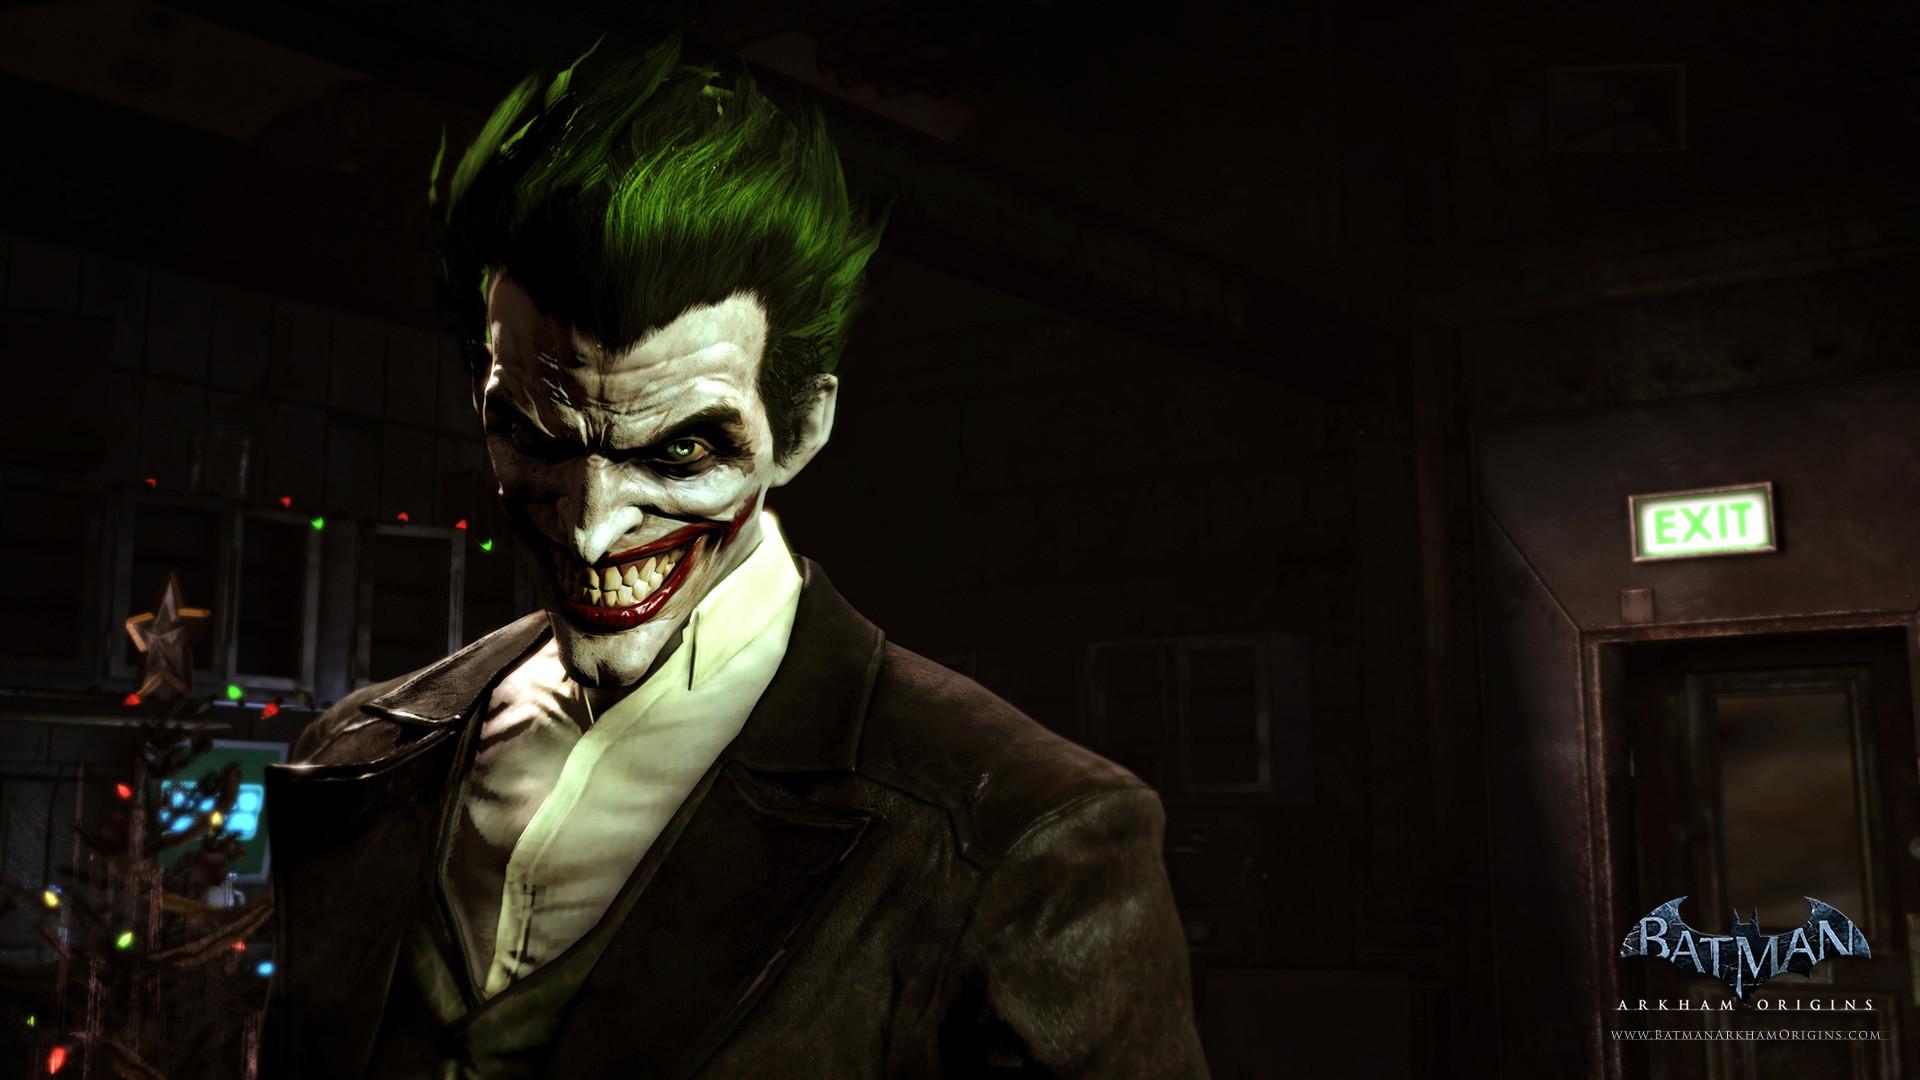 Joker, Deathstroke, Gordon and Batman feature in these HD Arkham Origins  wallpapers